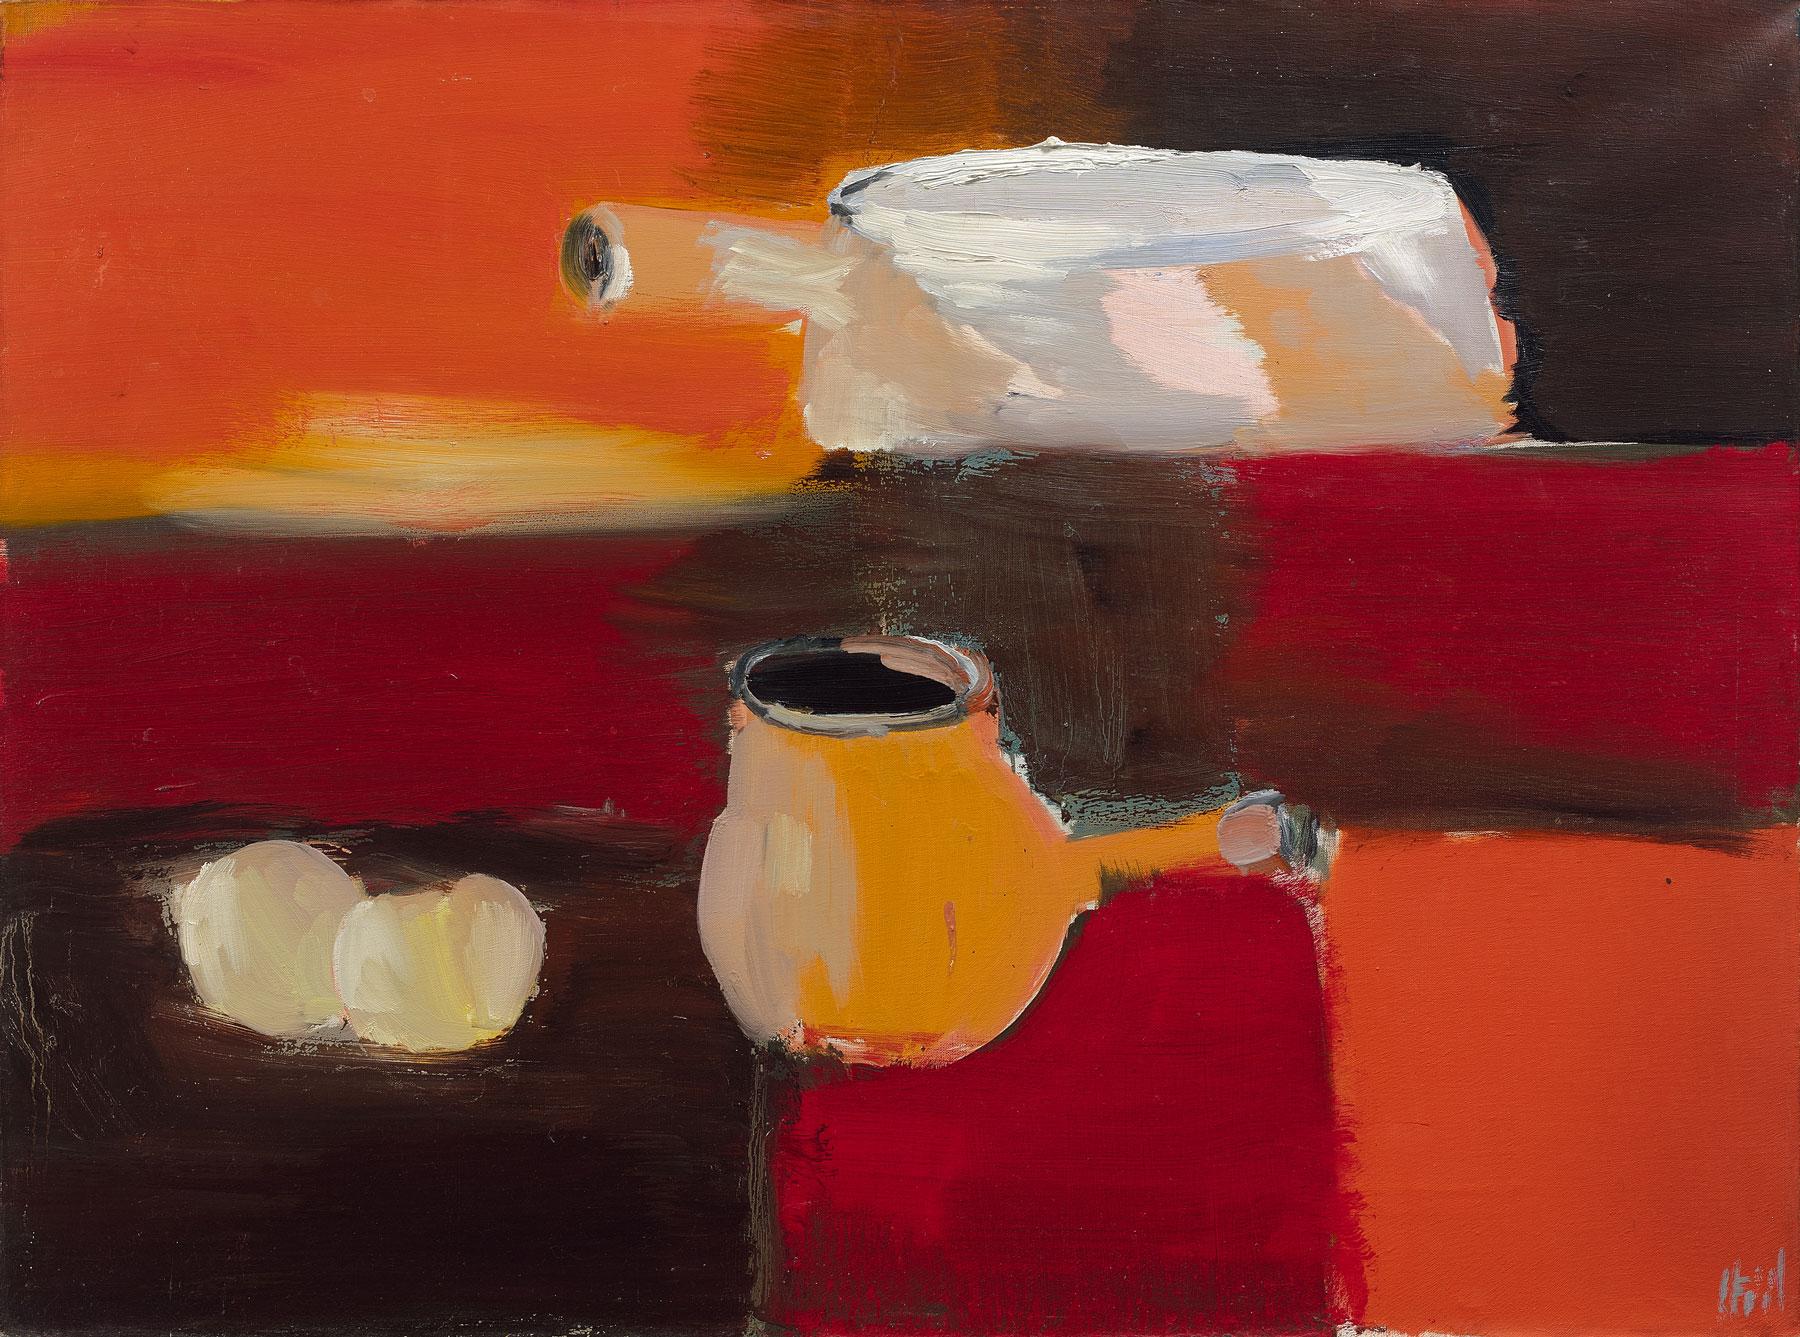 1.243.000 € per Marcel Duchamp all'asta da Artcurial